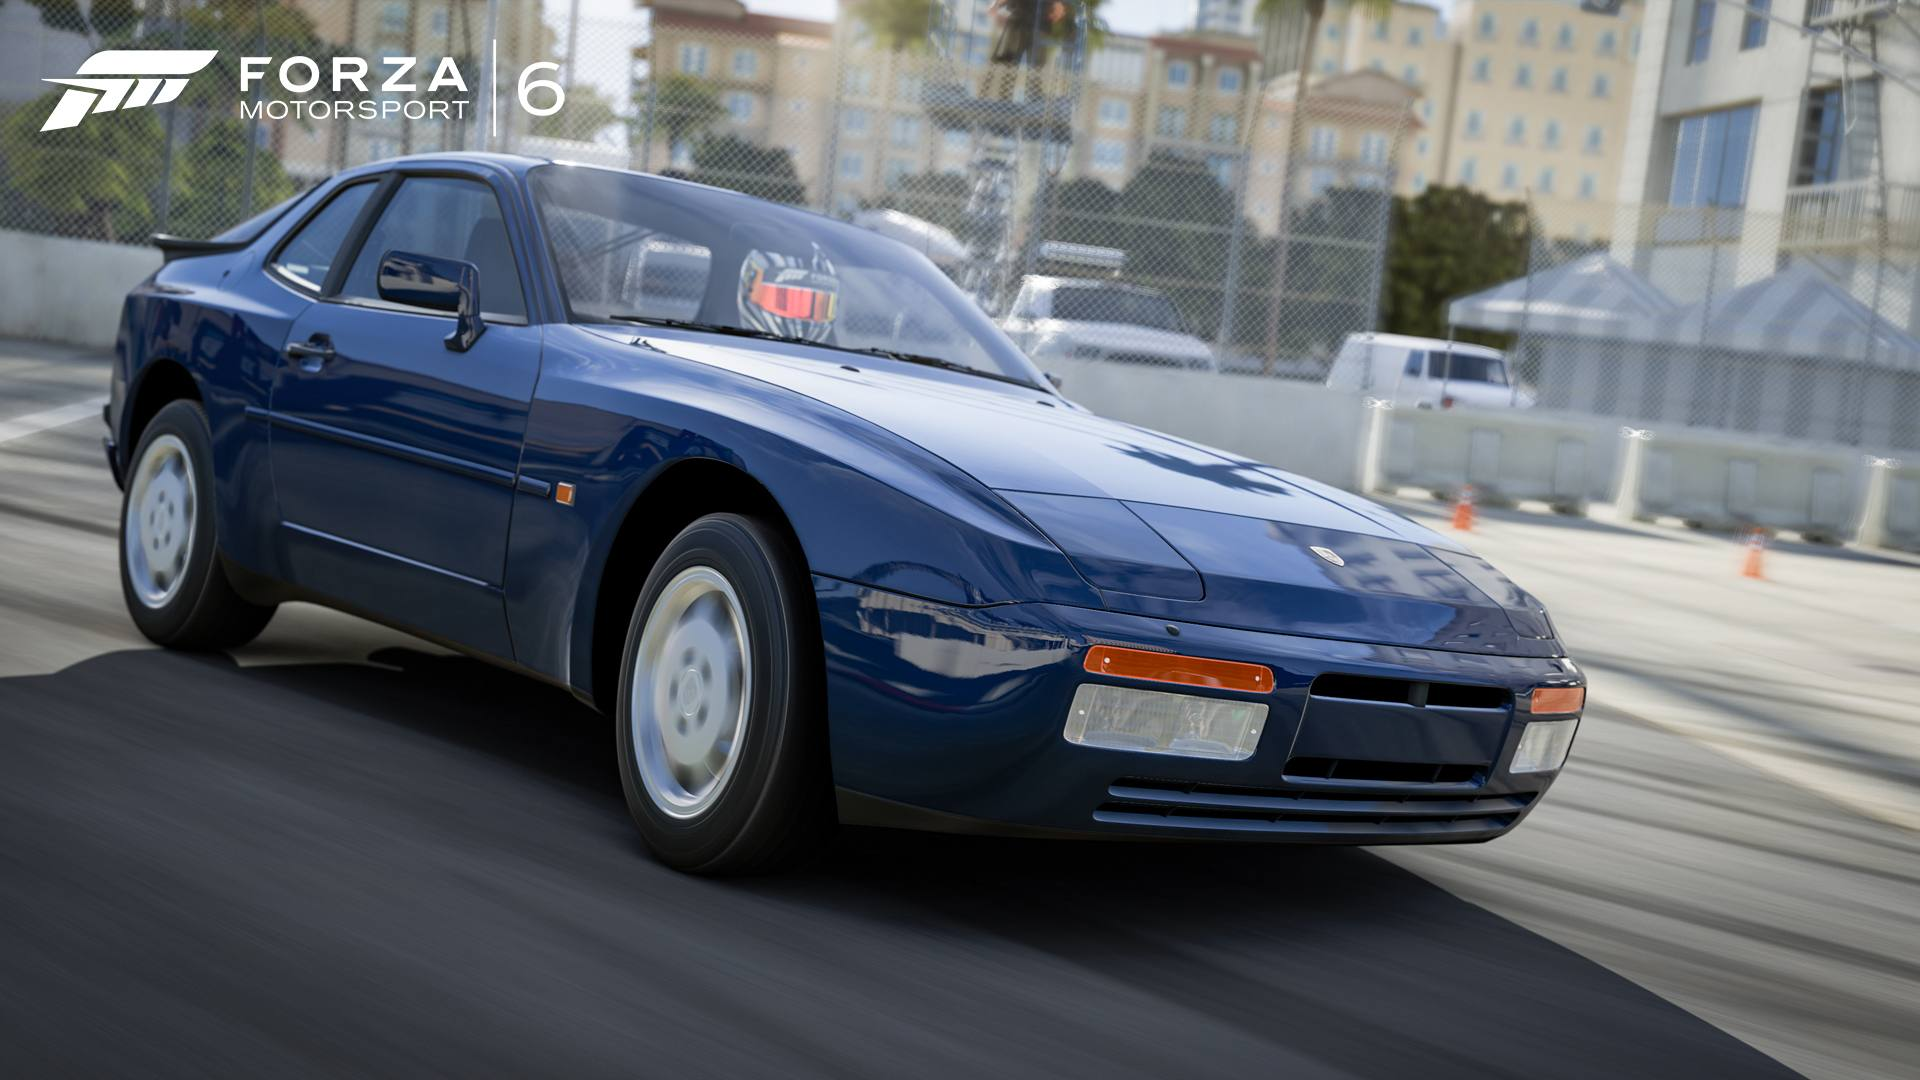 Forza Motorsport 6 01-03-16 1989 Porsche 944 Turbo